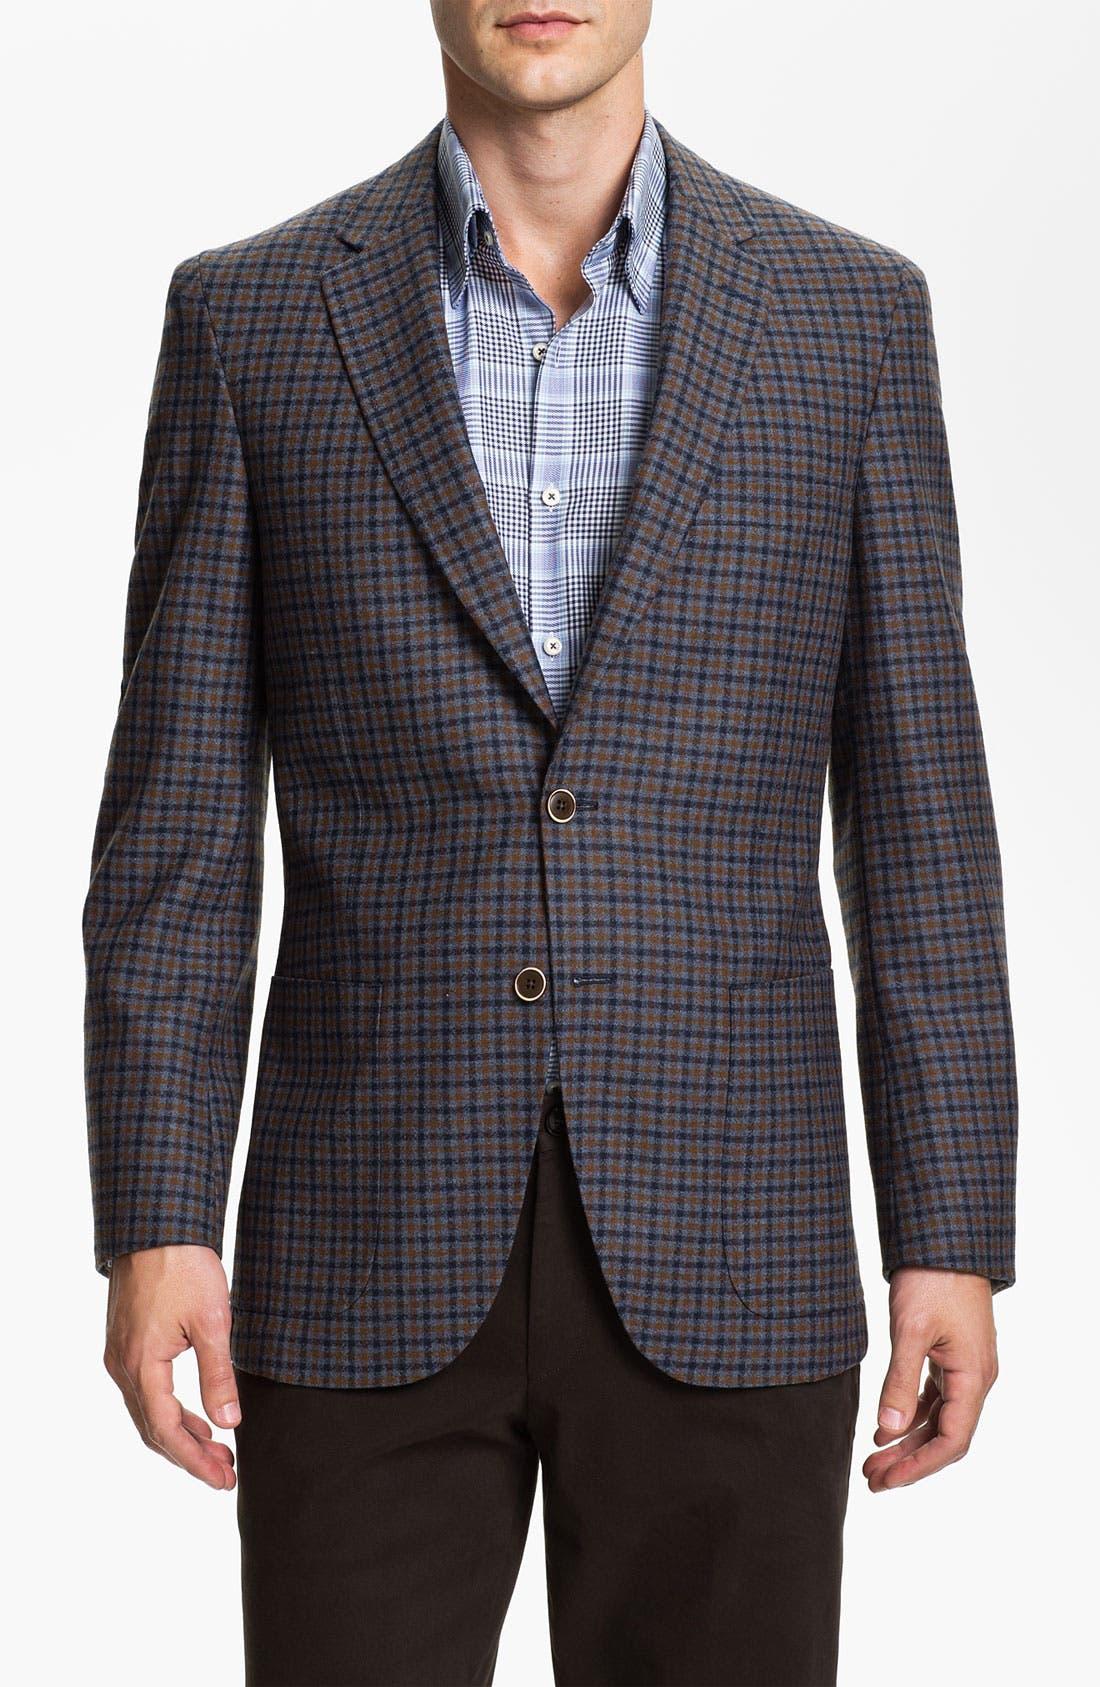 Alternate Image 1 Selected - Peter Millar Wool & Cashmere Sportcoat